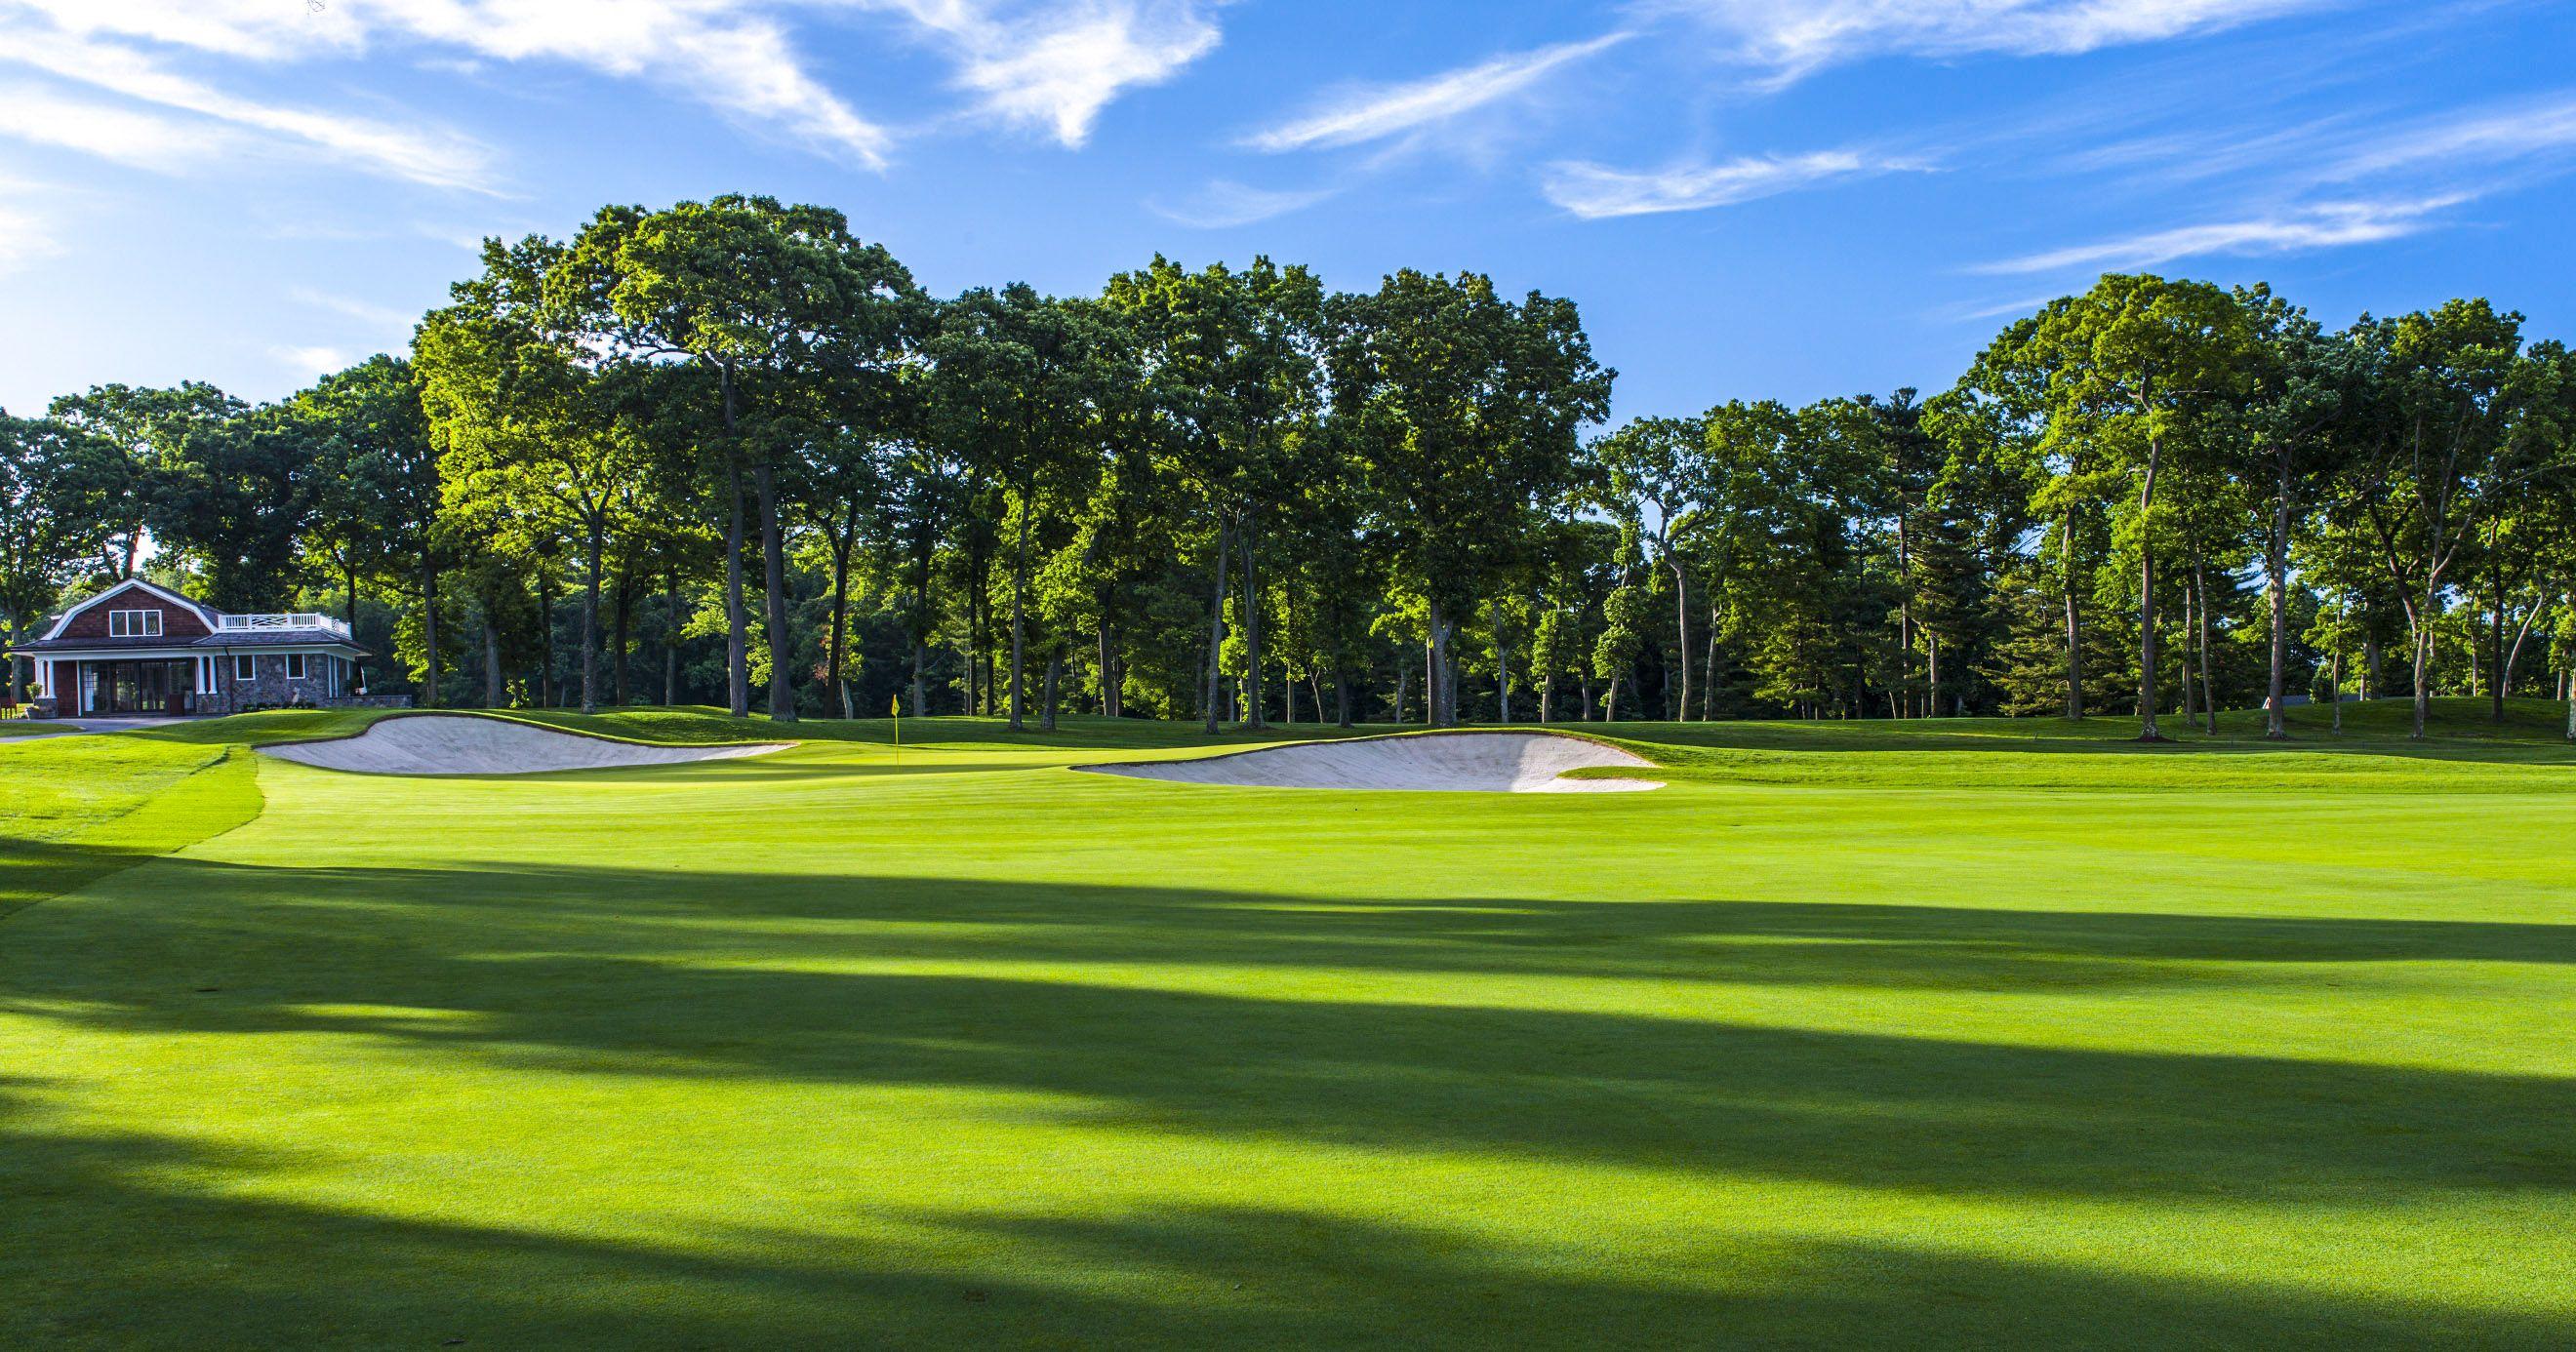 The Northern Trust At Glen Oaks Club In Old Westbury New York Golfcourseoftheday Rock Bottom Golf Rockbottomgolf Golf Clubs Golf Club Grips Golf